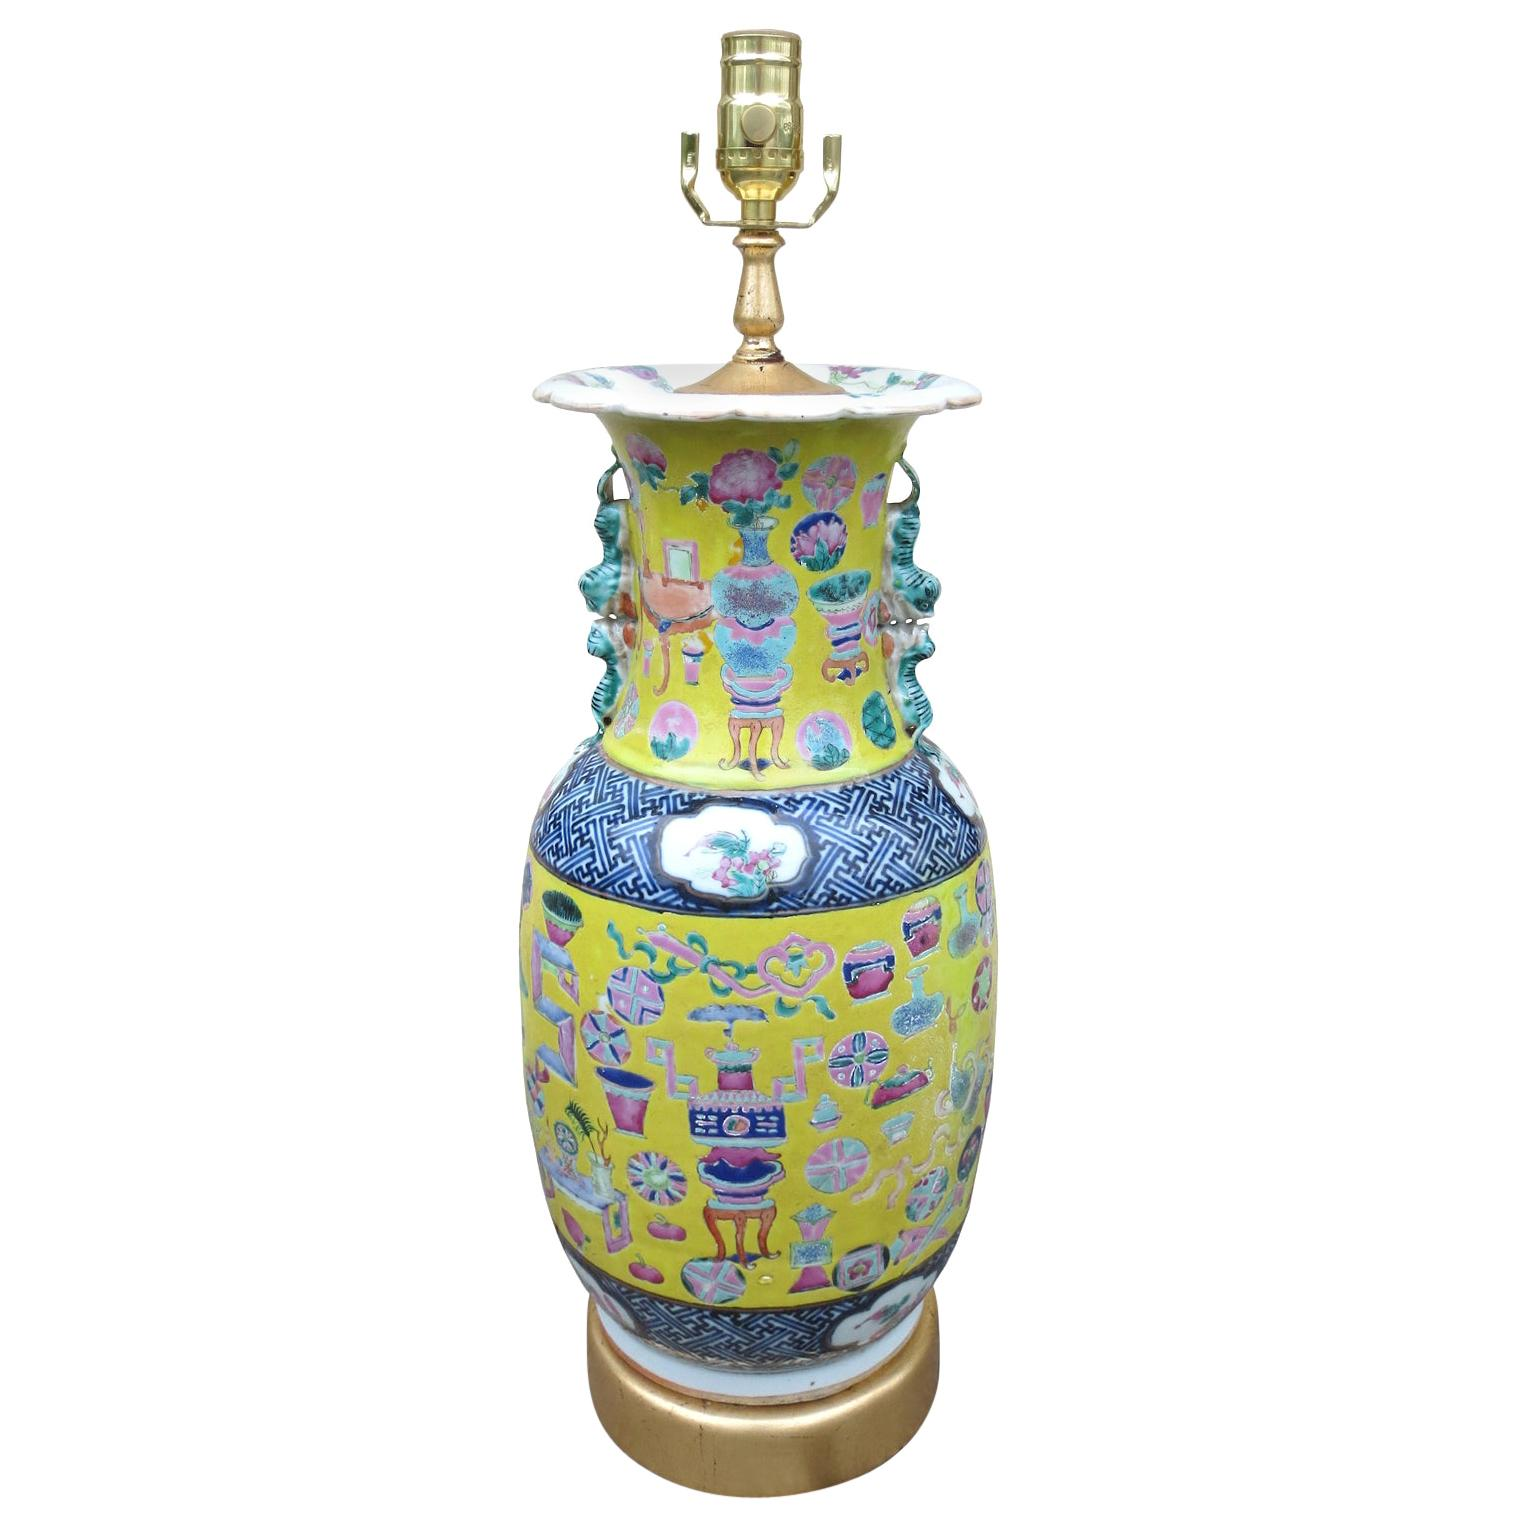 19th-20th Century Chinese Porcelain Vase as Lamp, Custom Giltwood Base